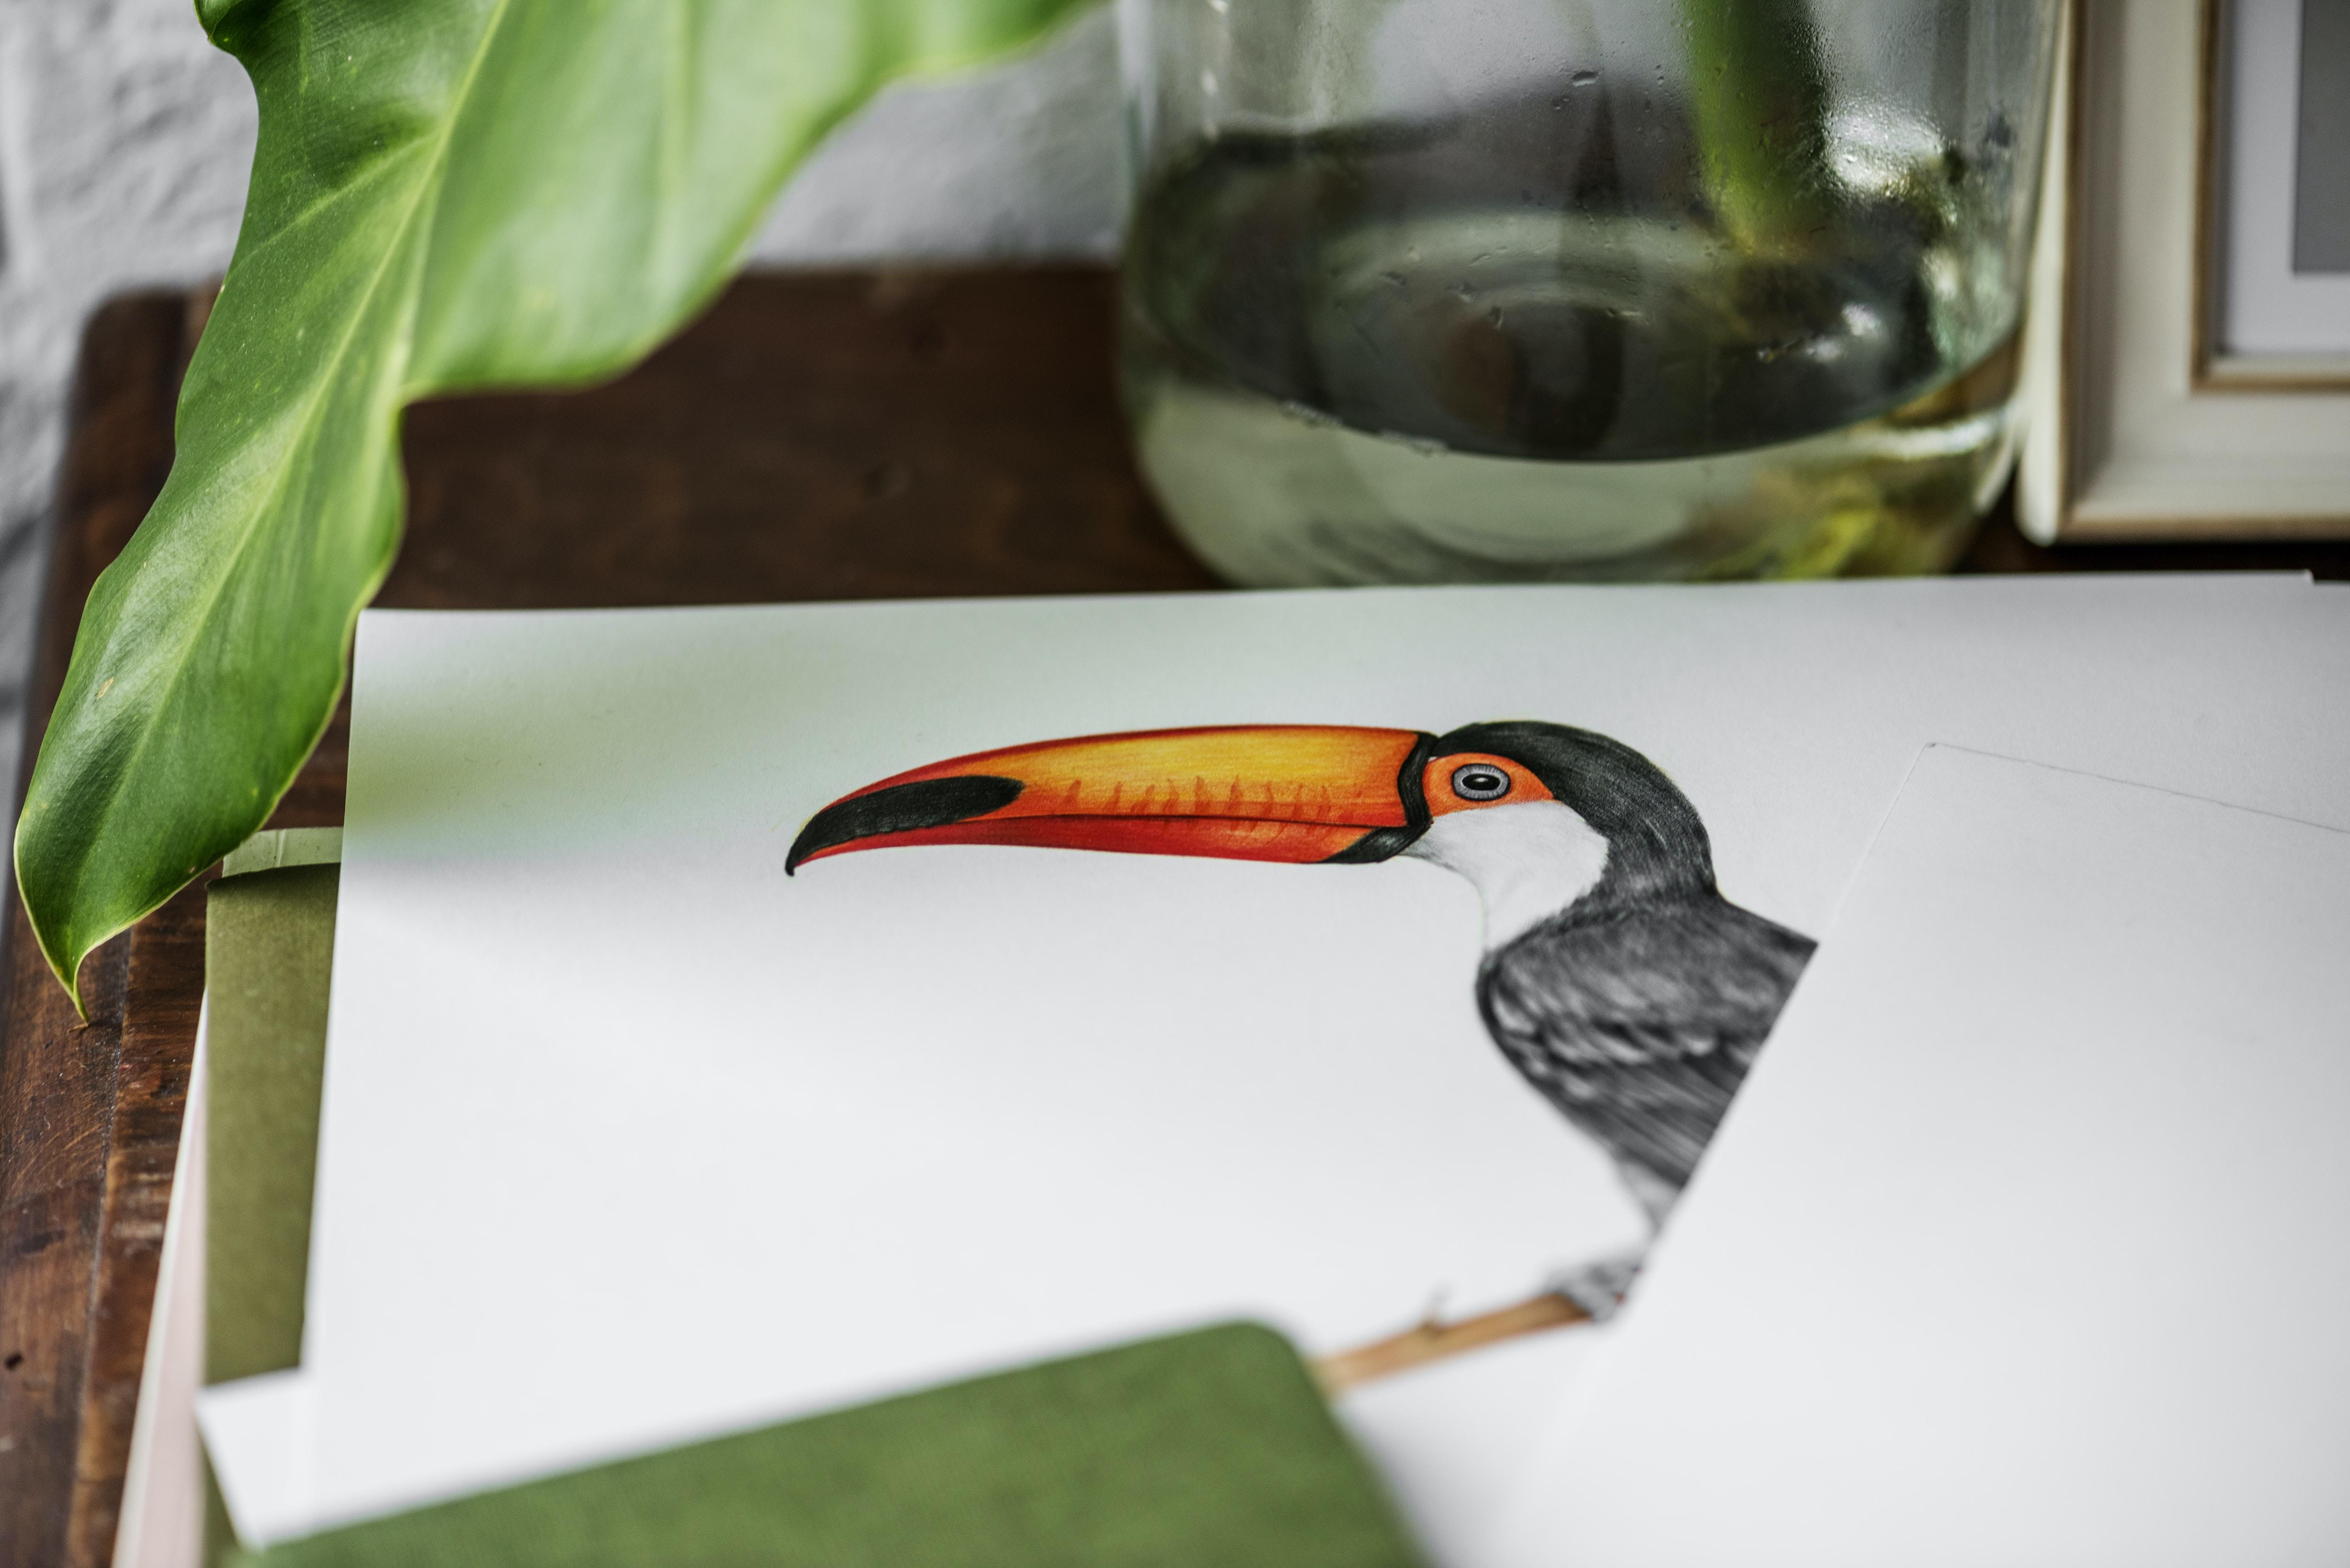 drawing of bird